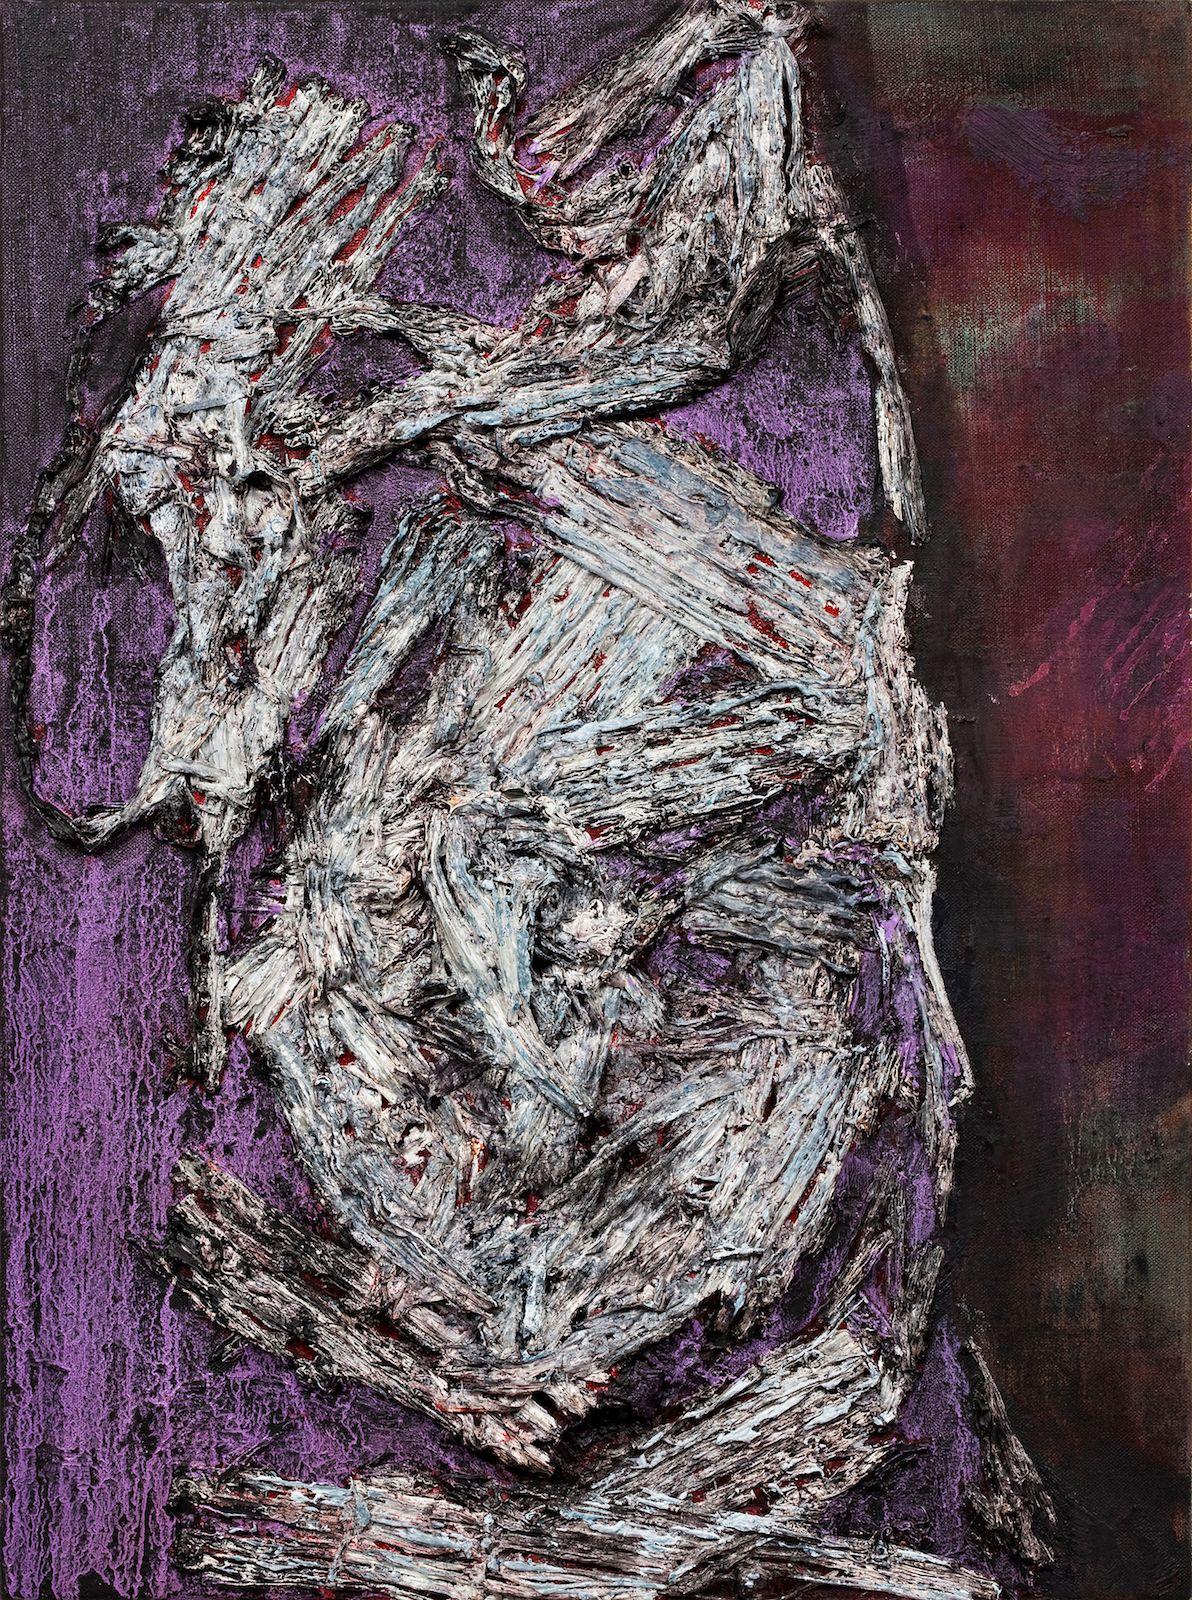 Tungetaler, 2009, oil on canvas on panel, 60 x 45 cm